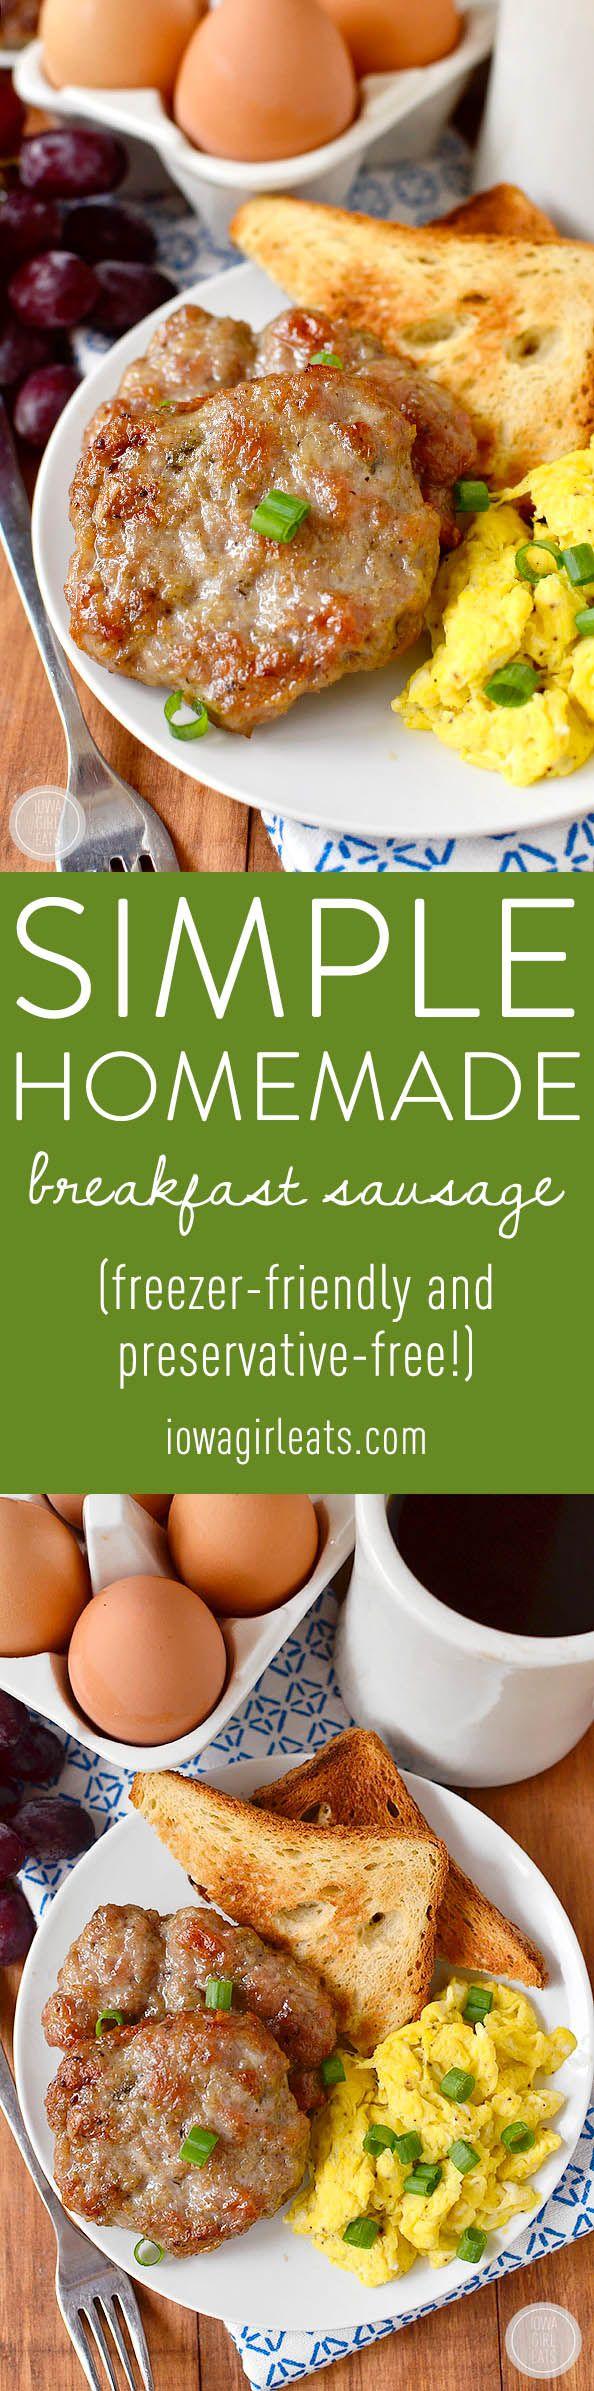 Old fashioned breakfast sausage recipe 1